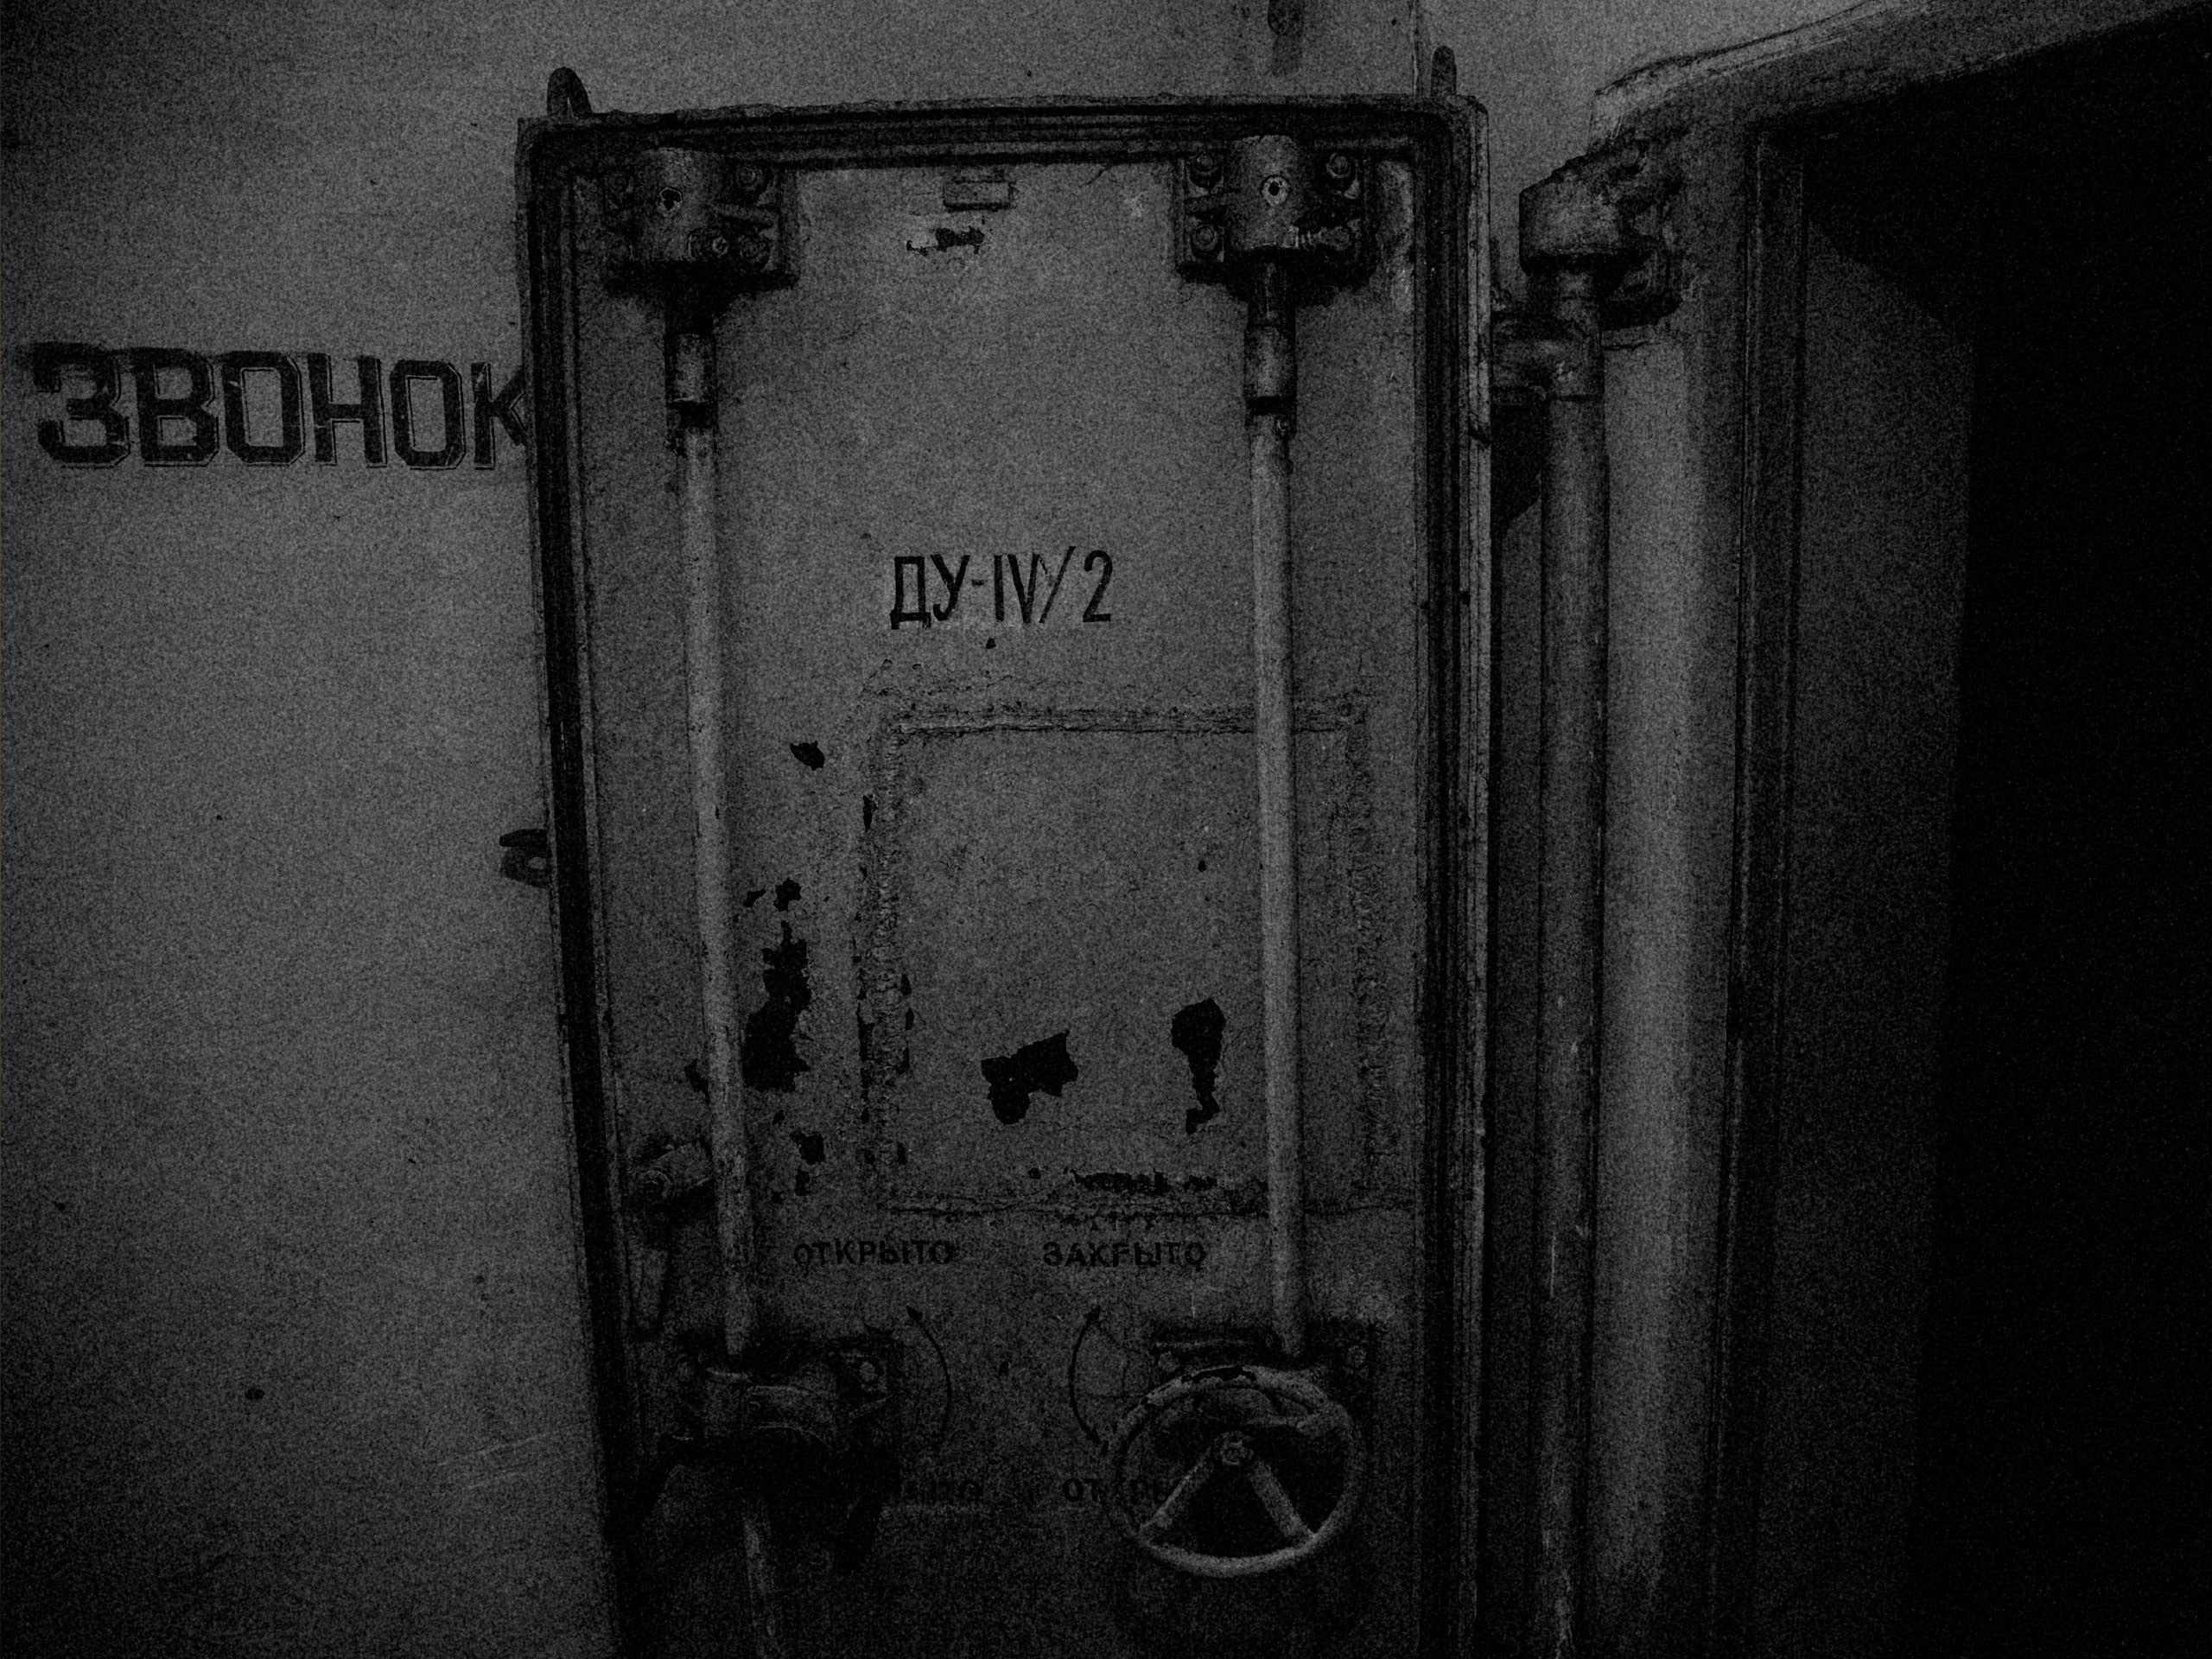 A heavy bomb door marks the entrance to the Trudovski shelter. Trudovski, Donetsk Oblast, Ukraine. Oct. 16, 2014.